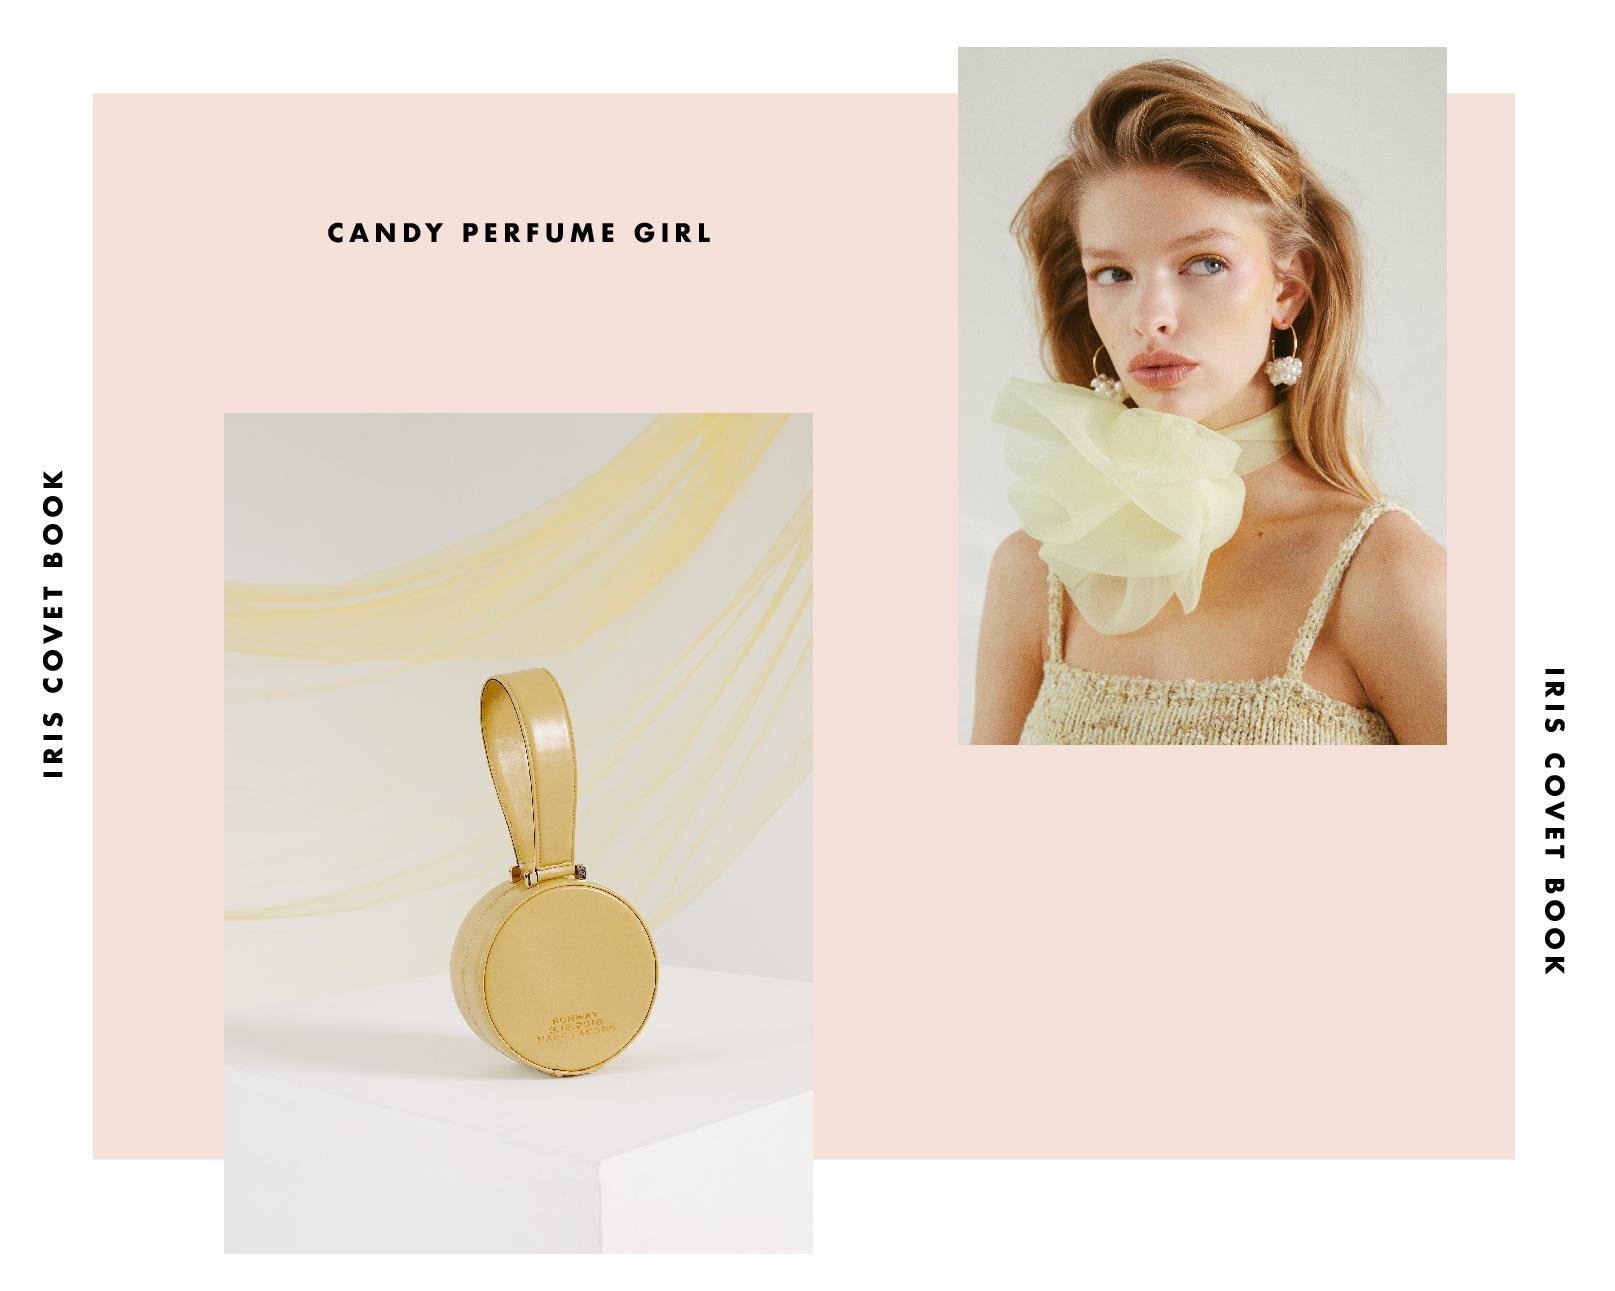 Candy Perfume Girl Snapshot-01.jpg